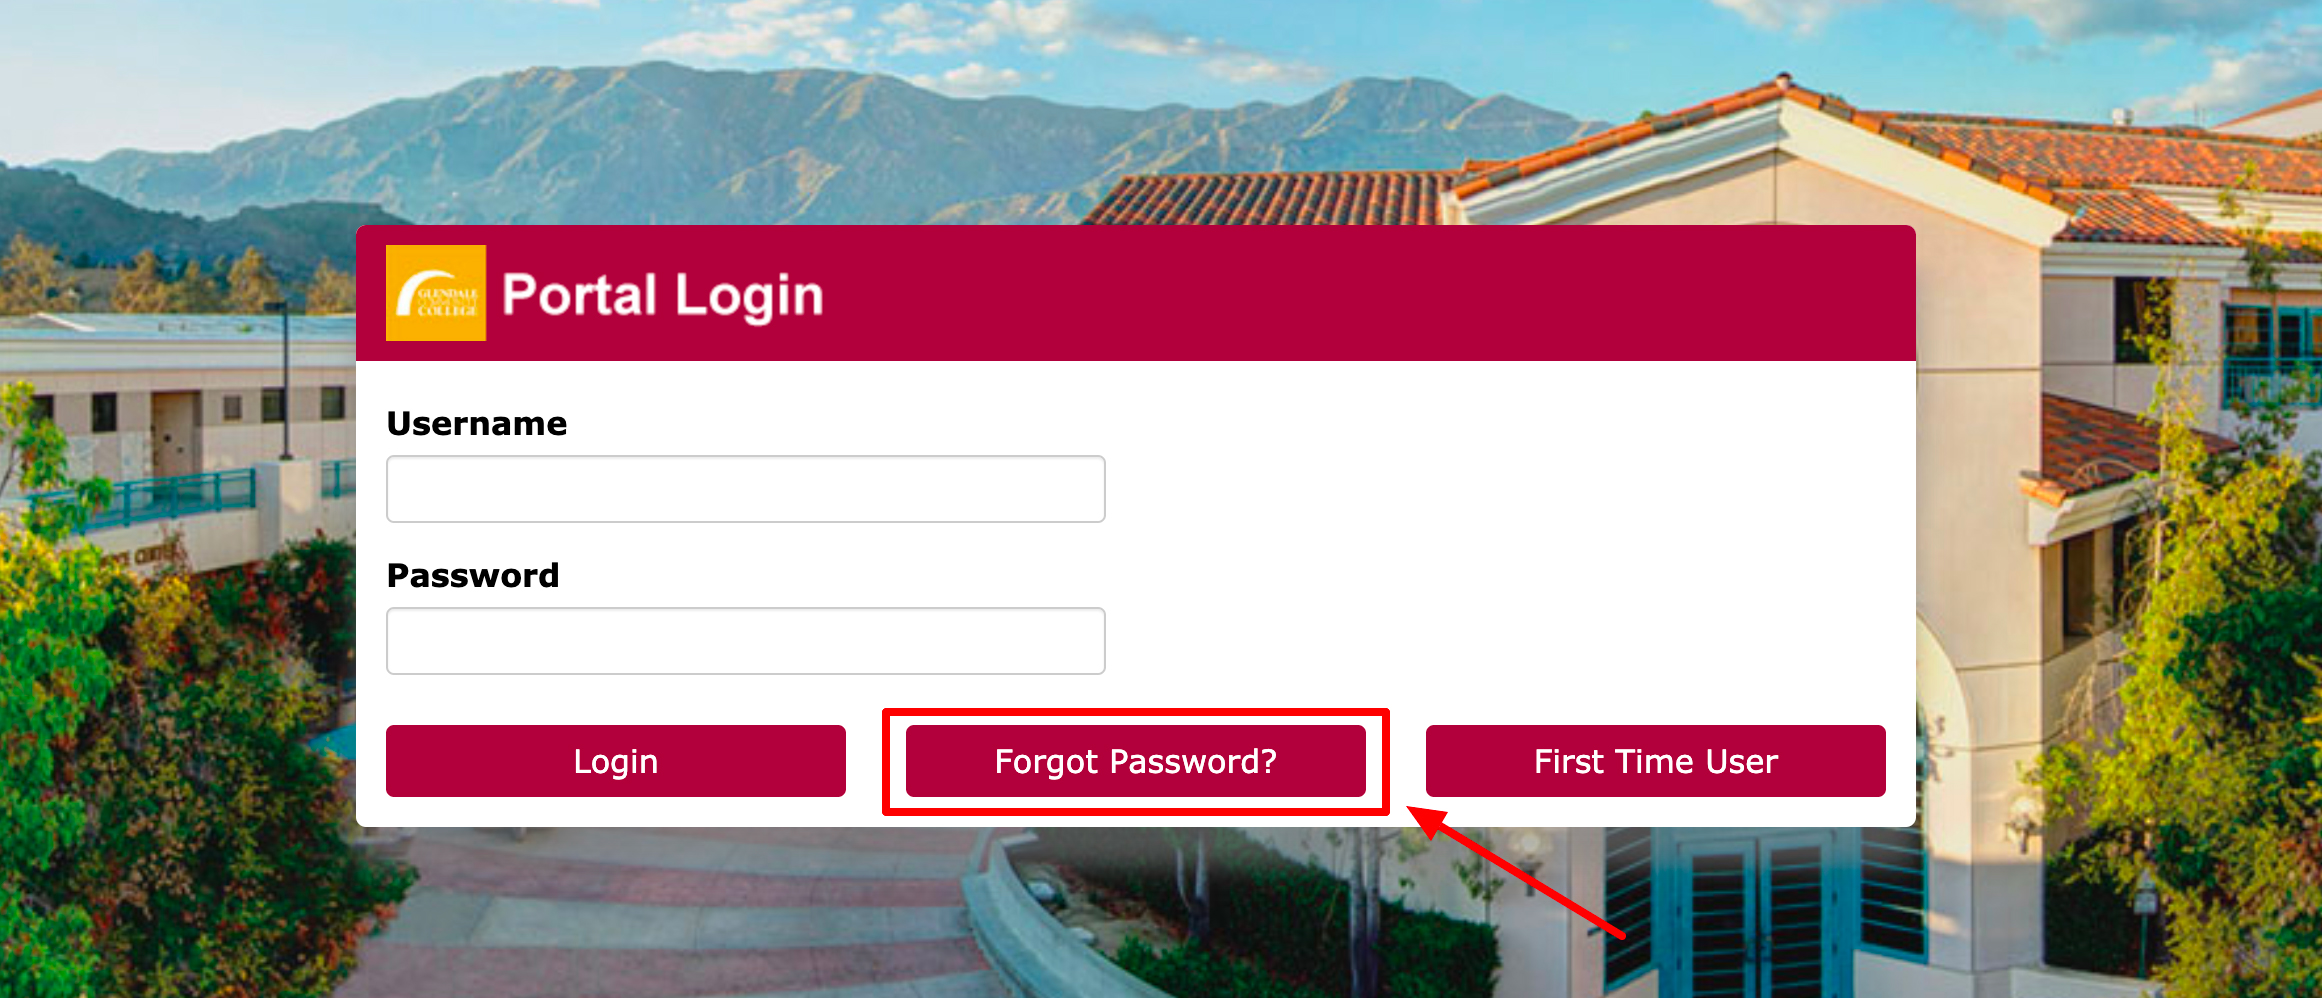 gcc student portal login